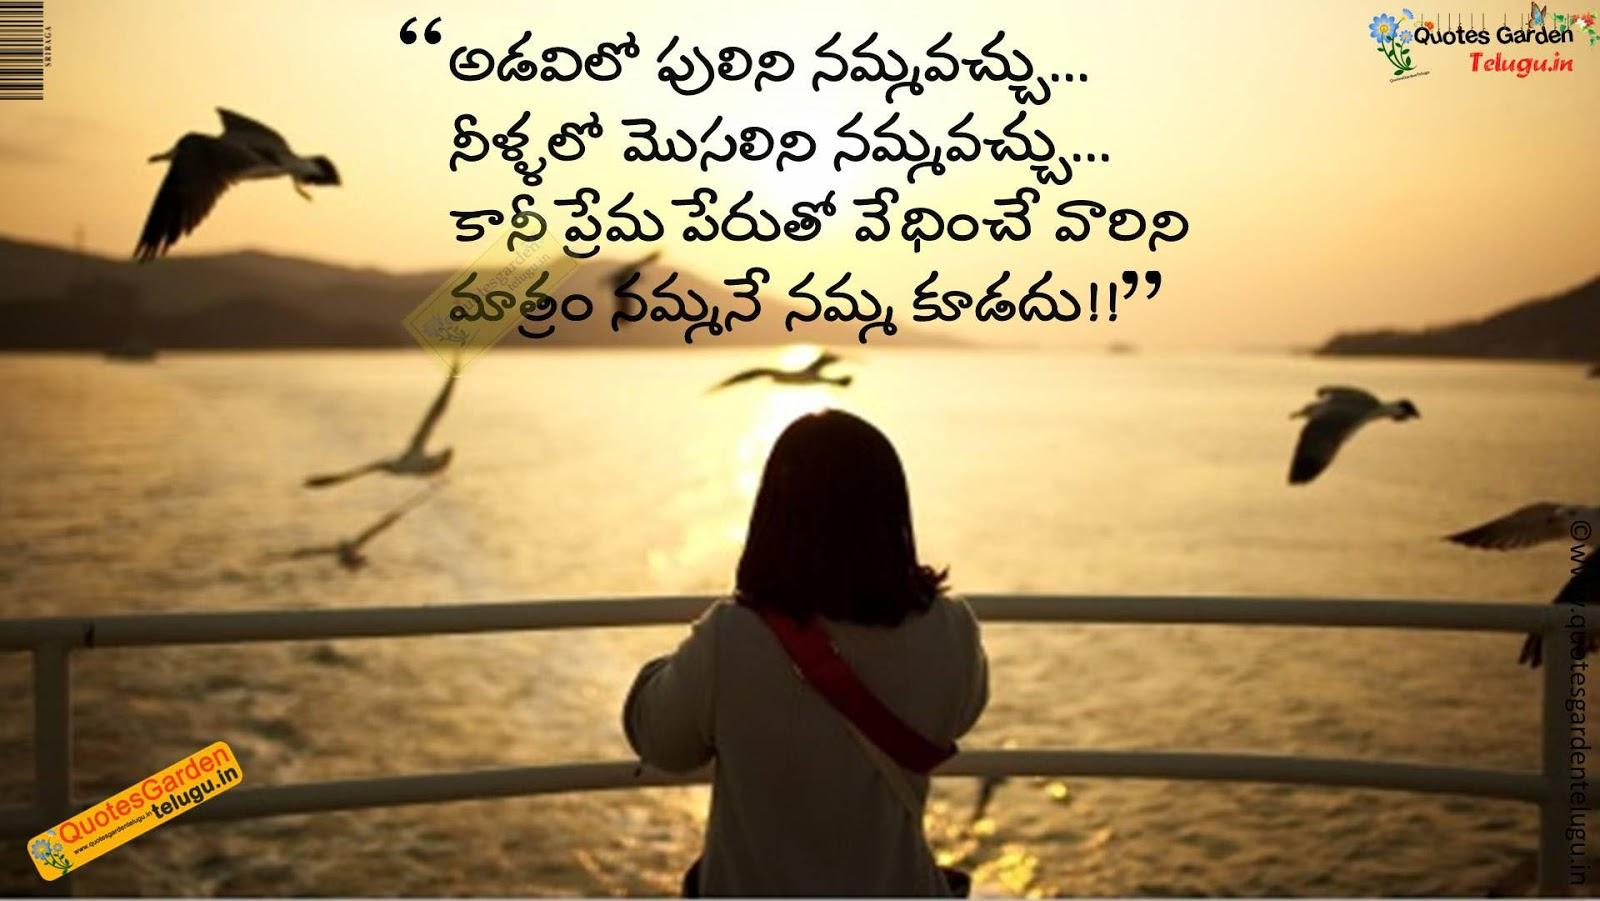 best telugu love failrure quotes for her 906 quotes